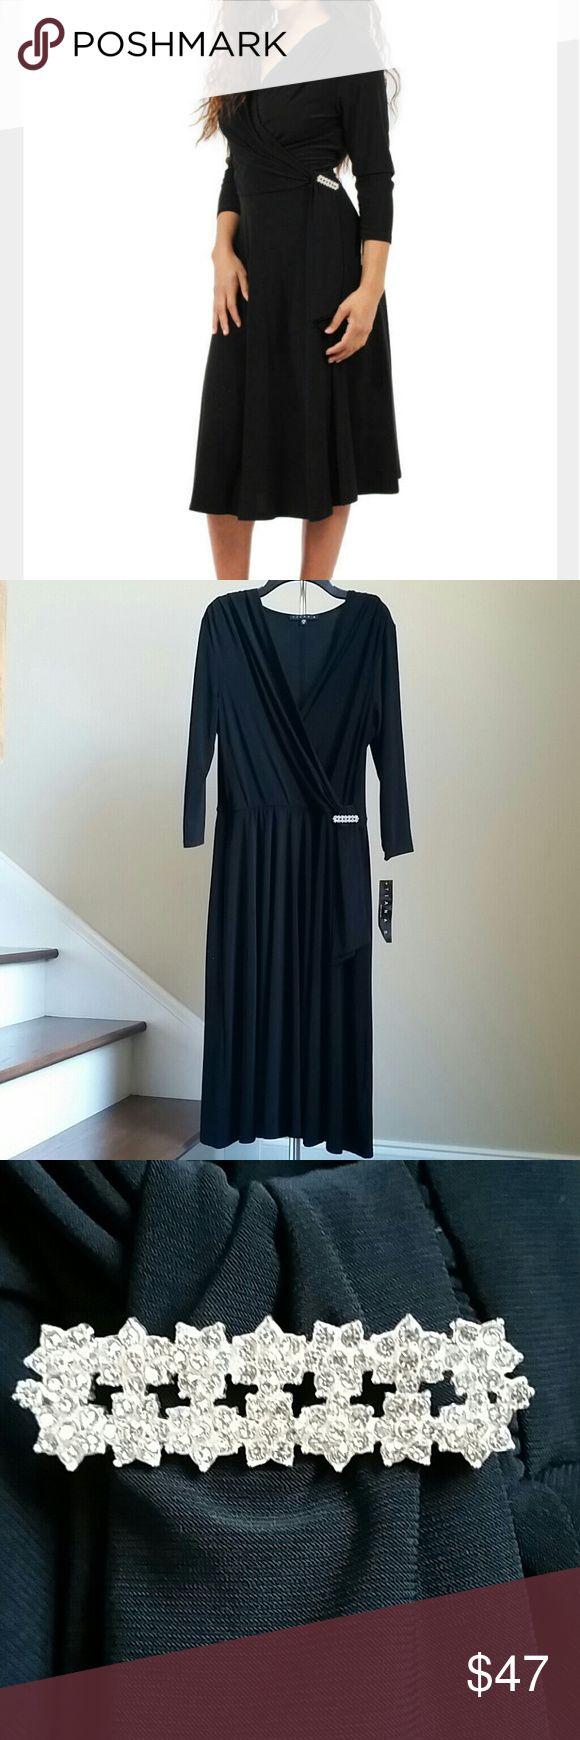 🆕30% OFF BUNDLES 🎉 TIANA B. DRESS Beautiful 3/4 sleeve jersey dress from Tiana B. 95% Polyester, 5% Spandex. Tiana B. Dresses